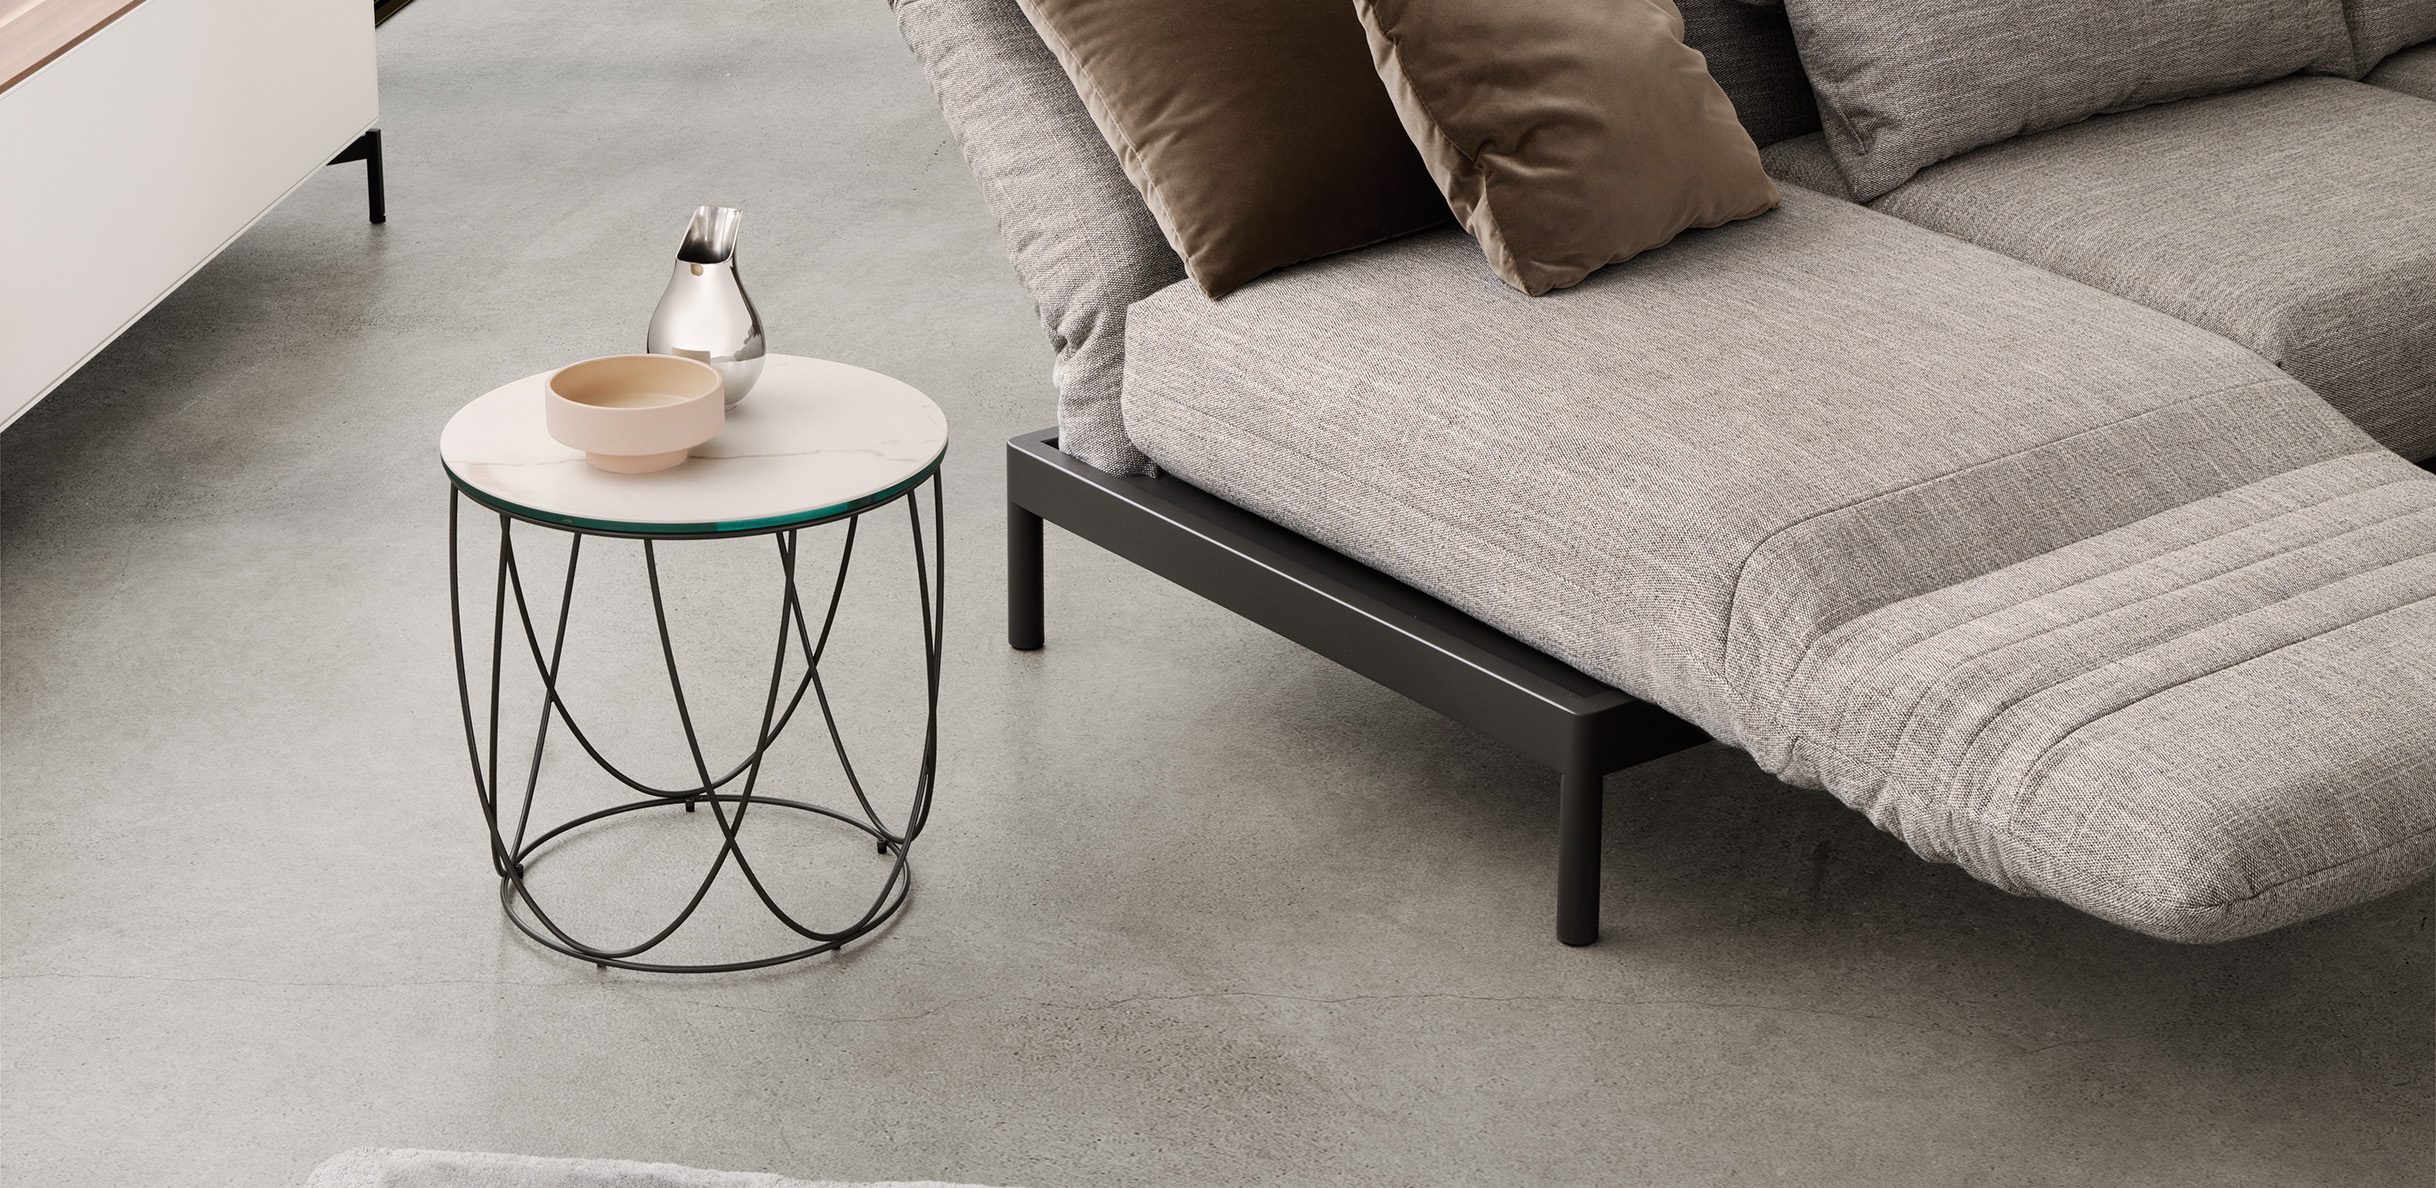 couchtisch rolf benz ct rb 8770 m bel bise. Black Bedroom Furniture Sets. Home Design Ideas